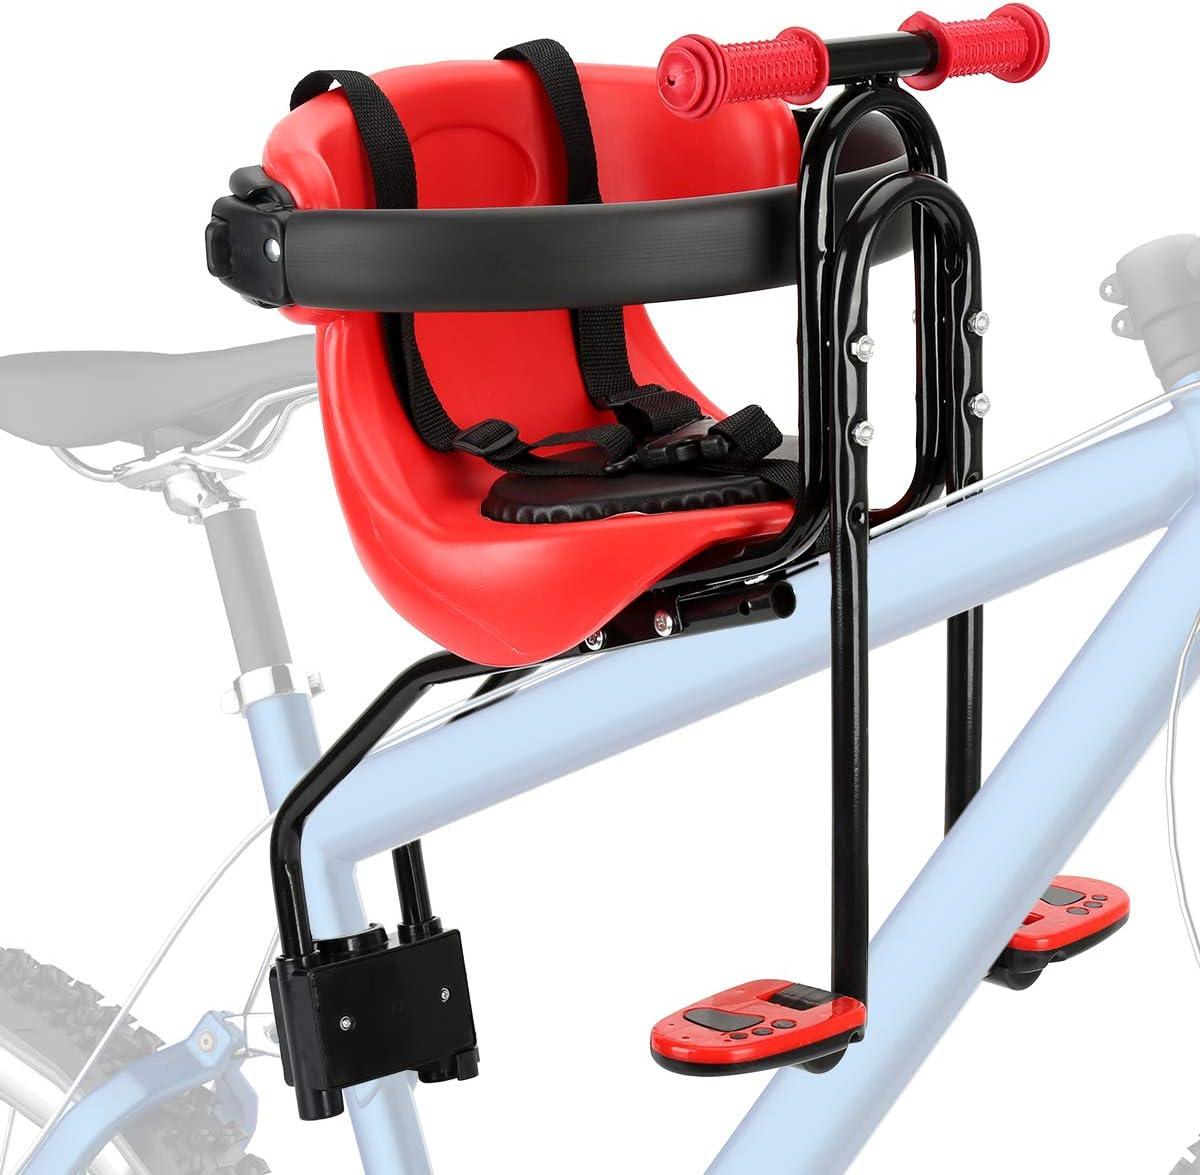 Bicycle child seat front mountain bike folding bike bicycle electric car baby